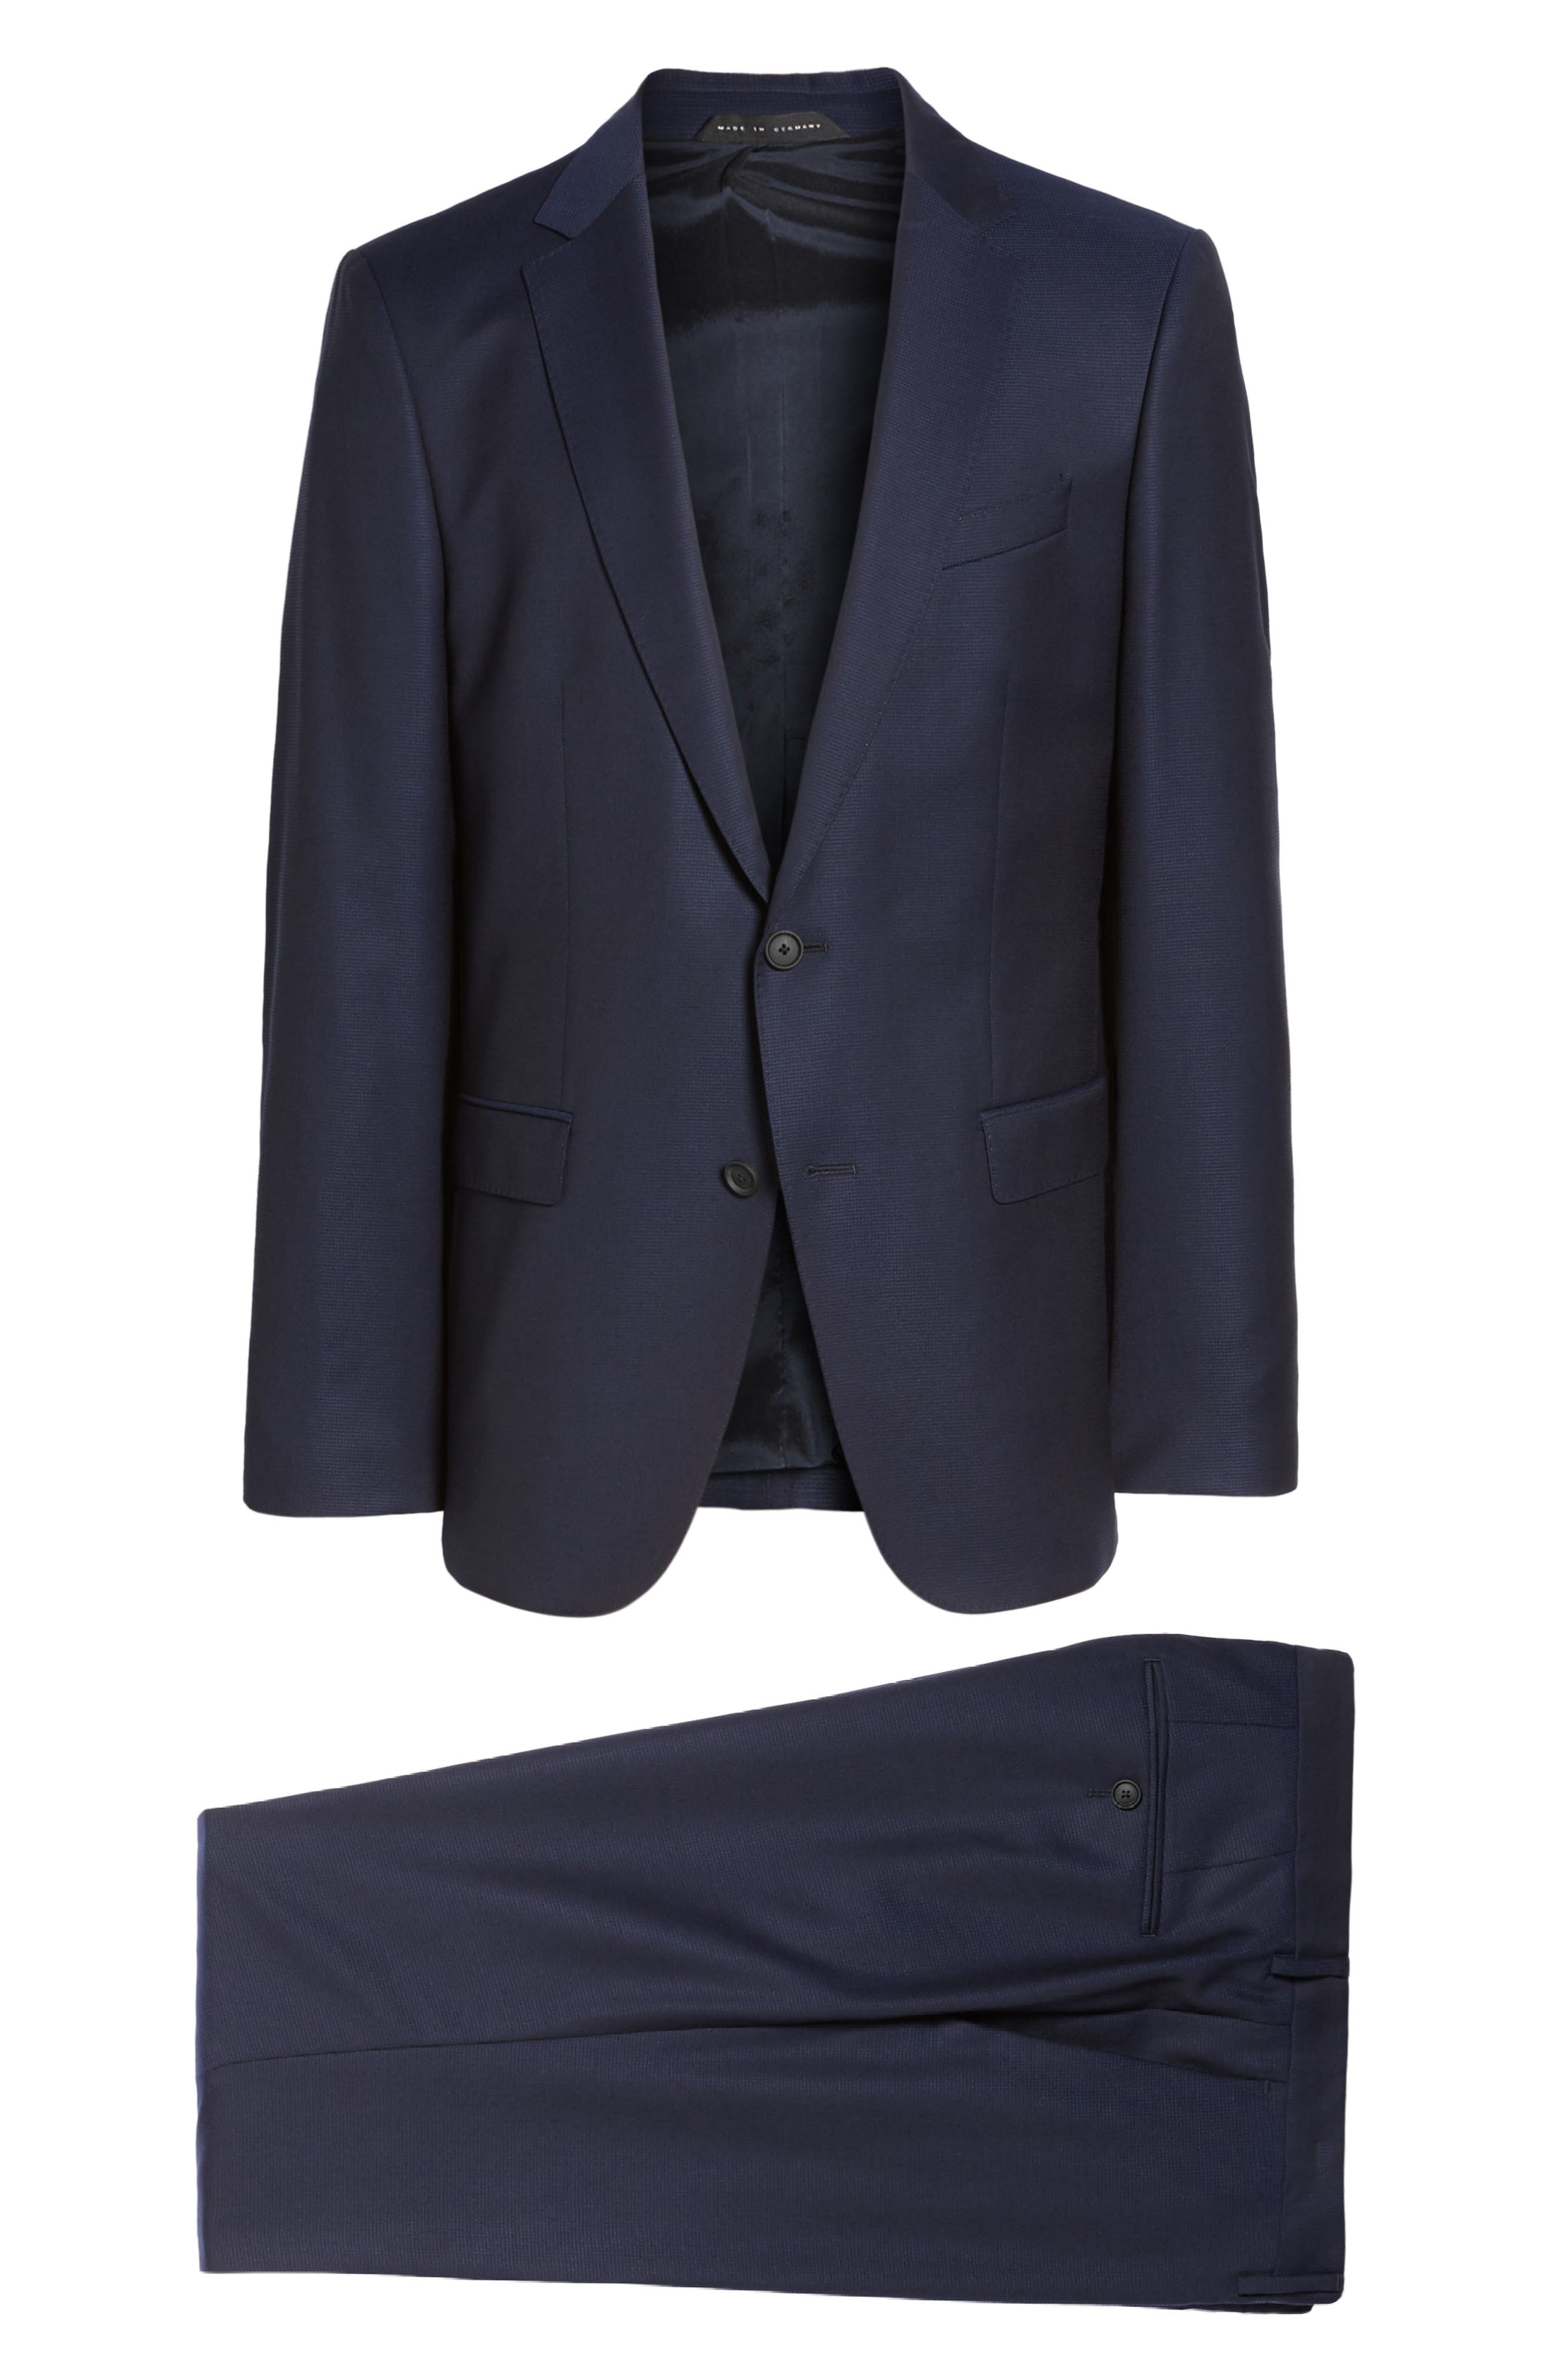 Nestro/Byte Trim Fit Solid Wool Suit,                             Alternate thumbnail 8, color,                             410